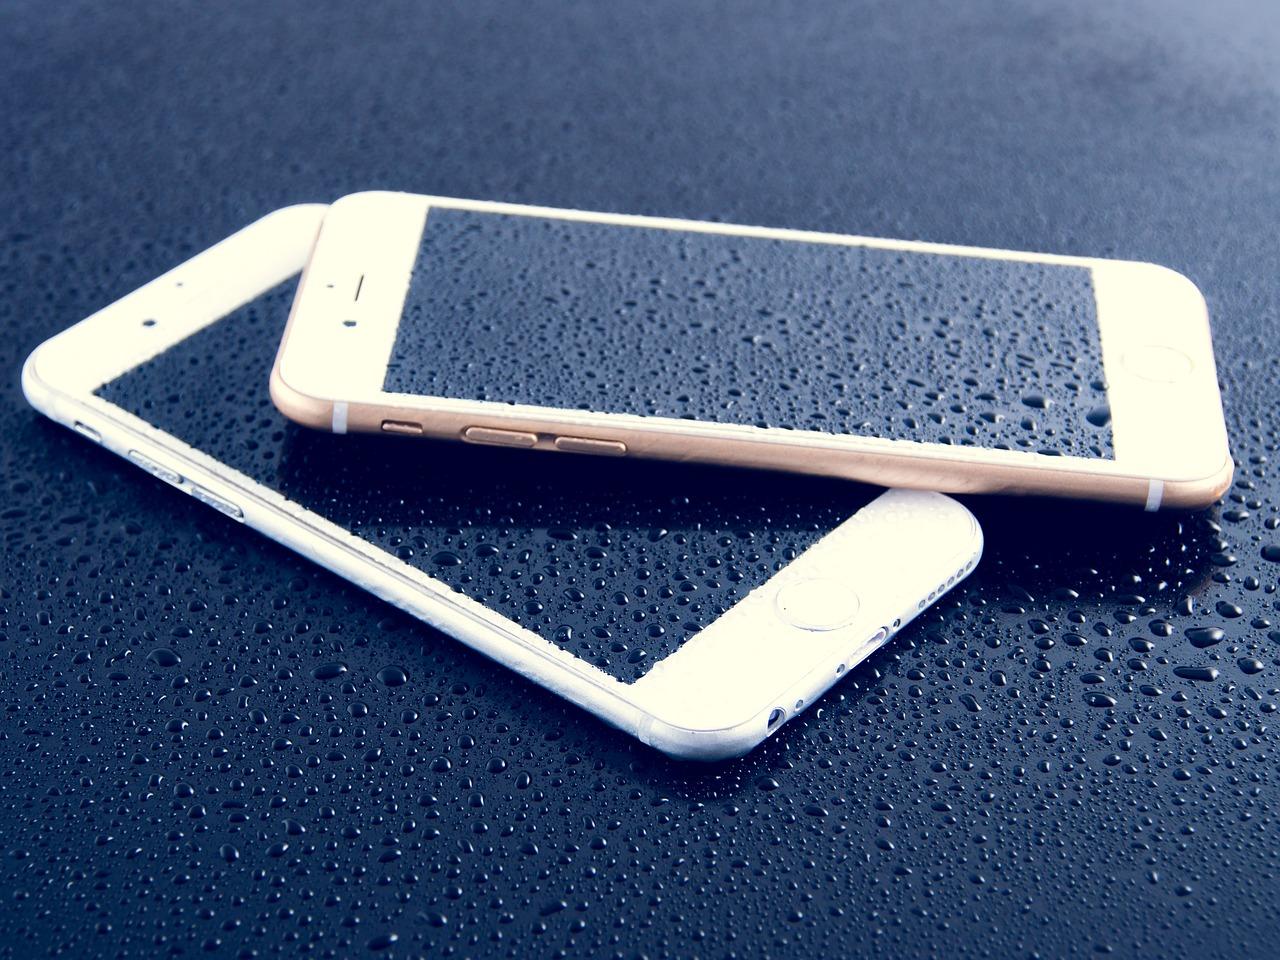 Dwa telefony iPhone.